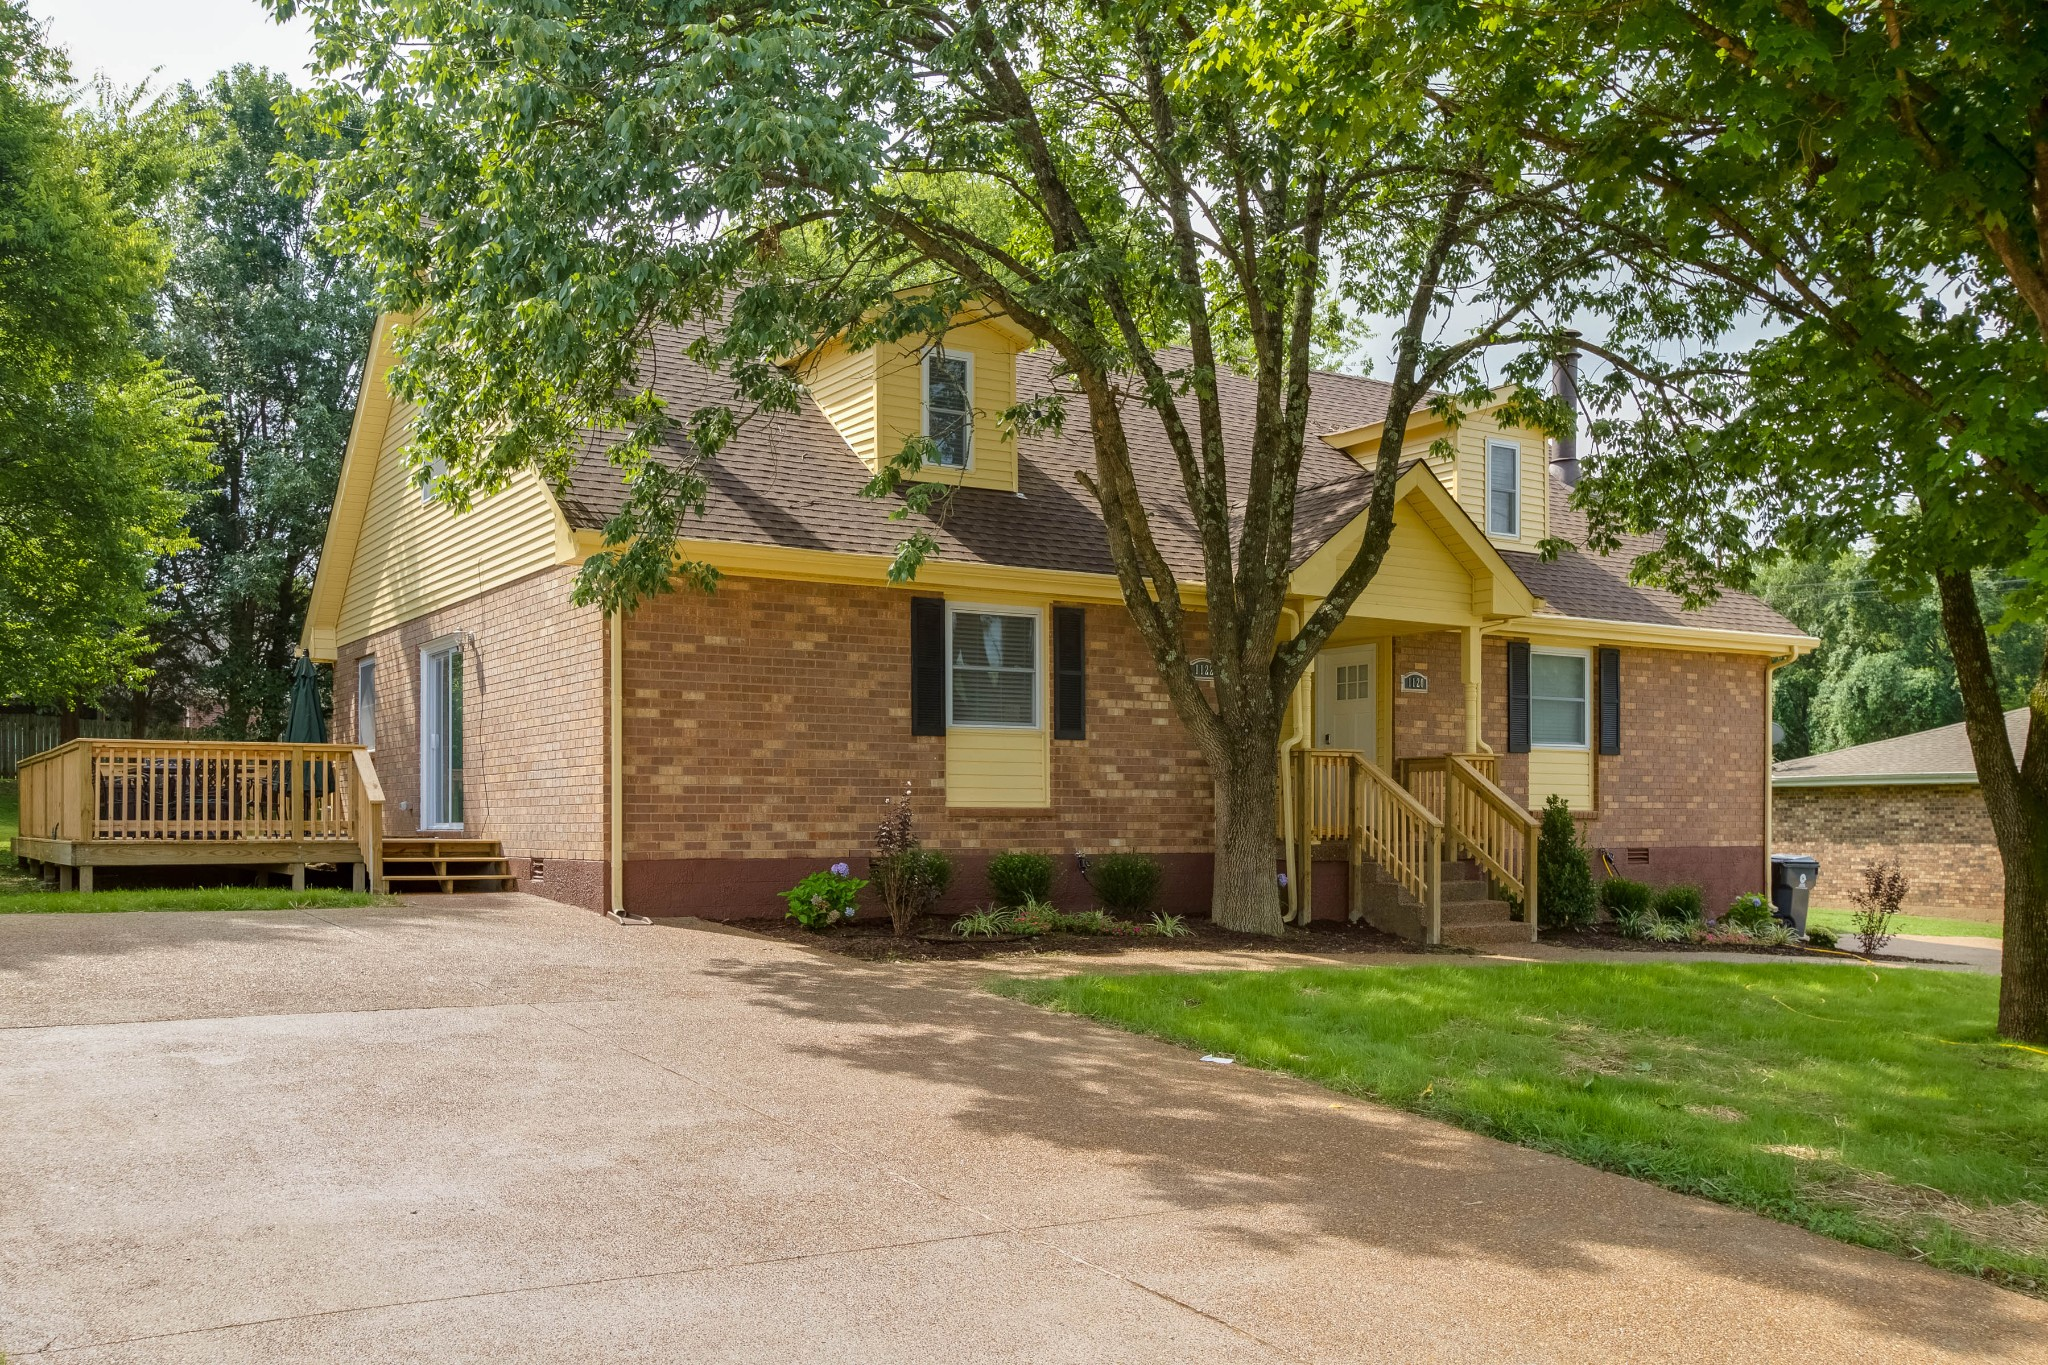 1122 N Graycroft Ave Property Photo - Madison, TN real estate listing